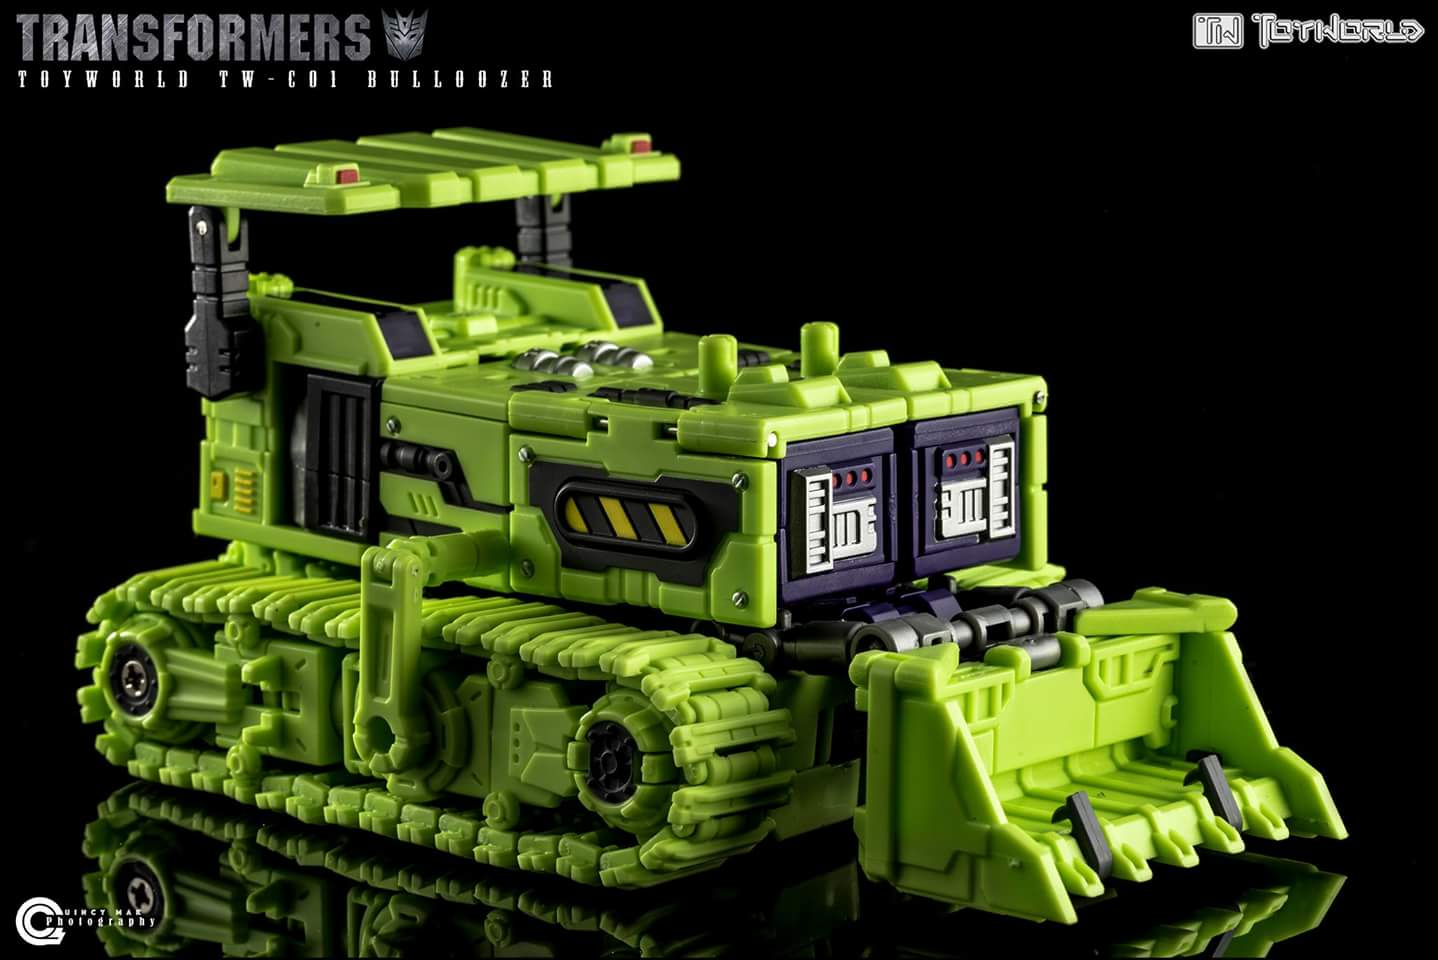 [Toyworld] Produit Tiers - Jouet TW-C Constructor aka Devastator/Dévastateur (Version vert G1 et jaune G2) - Page 3 XfIxqDbO